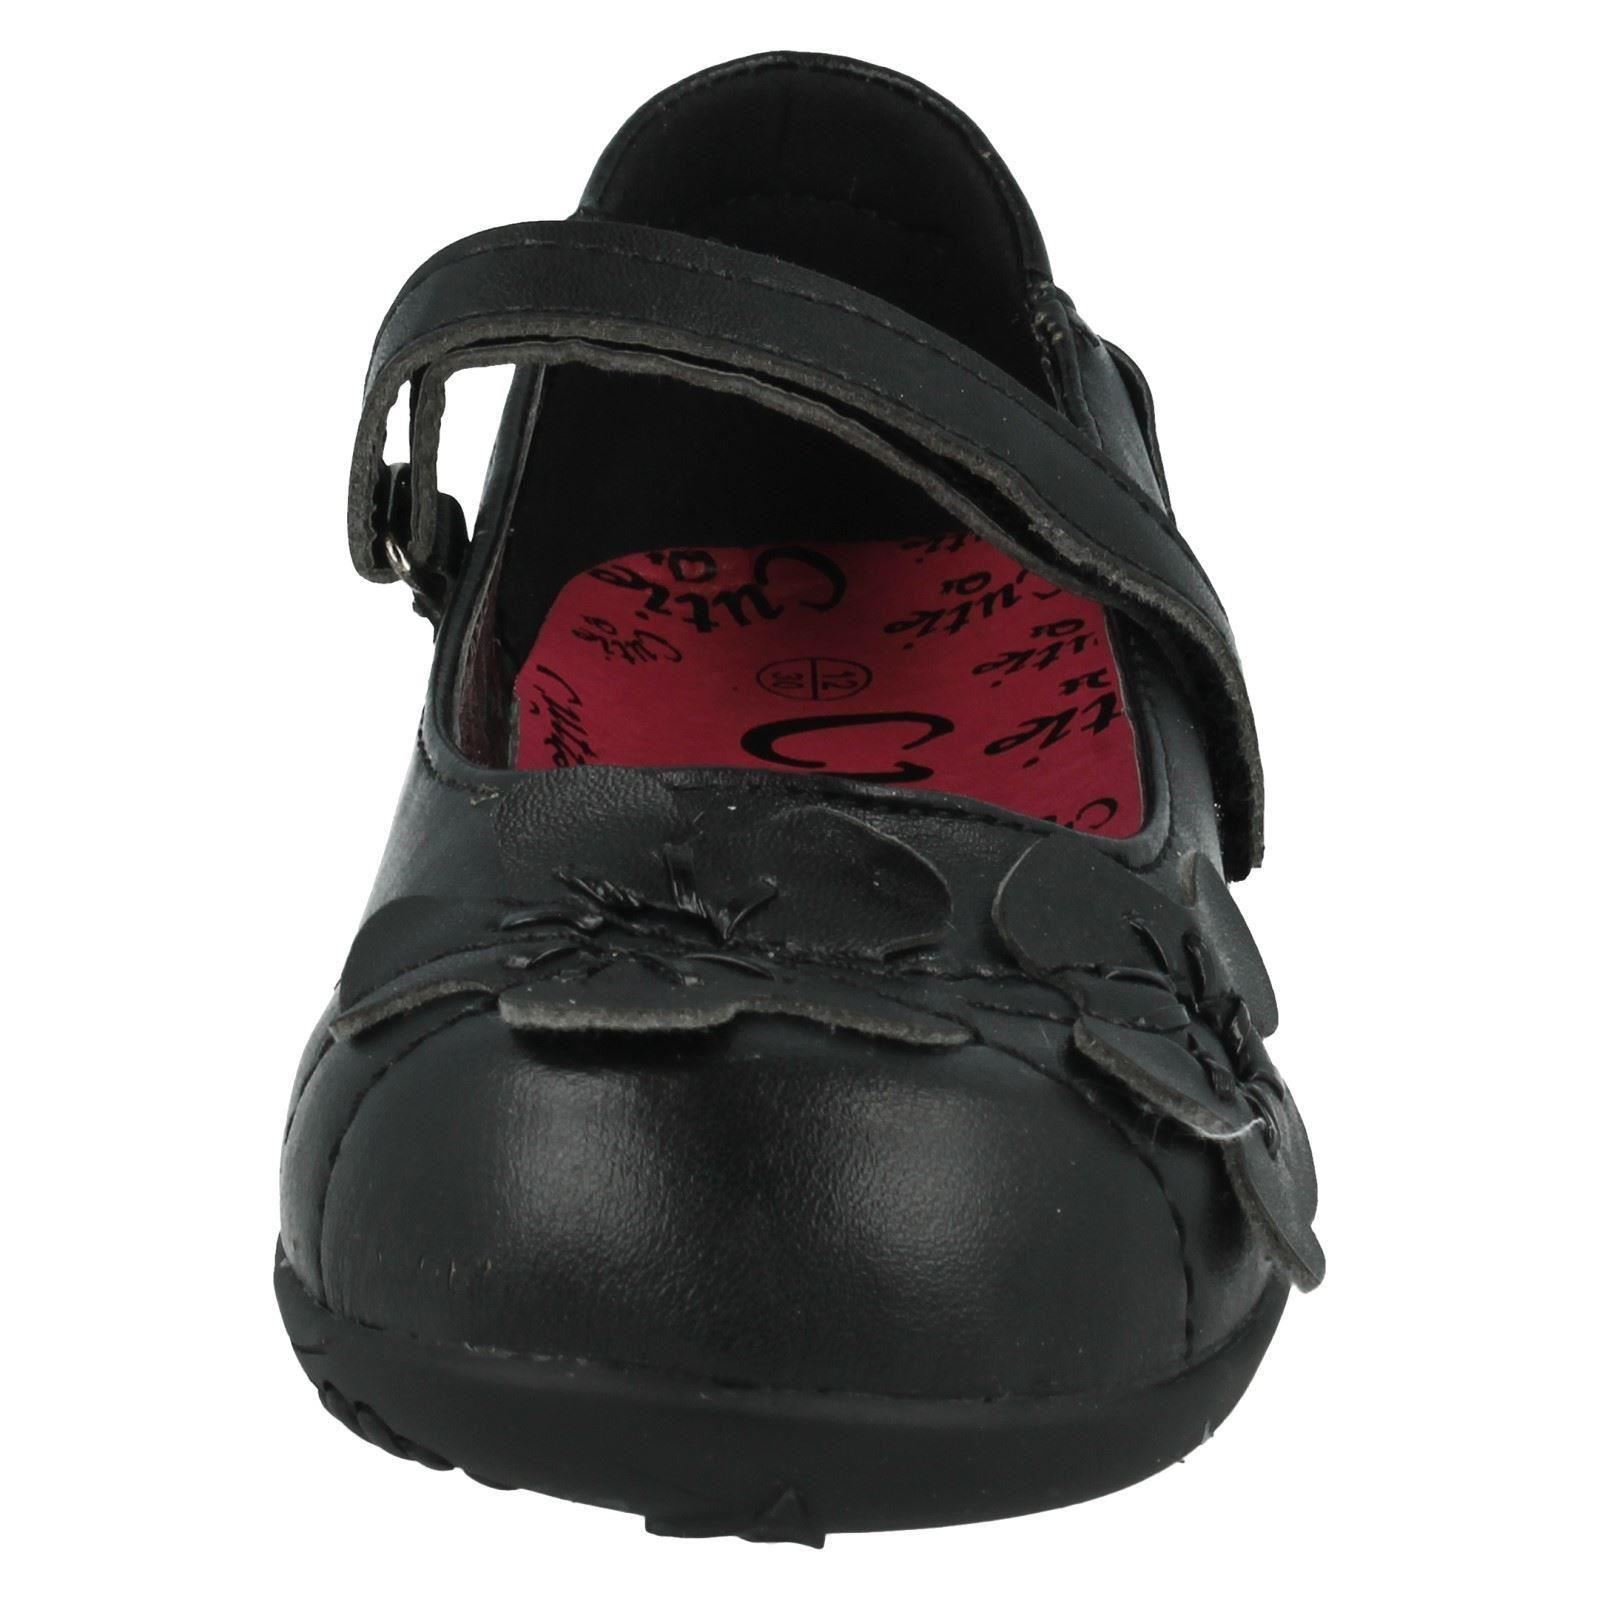 Chicas Monina Qt Zapatos h2216